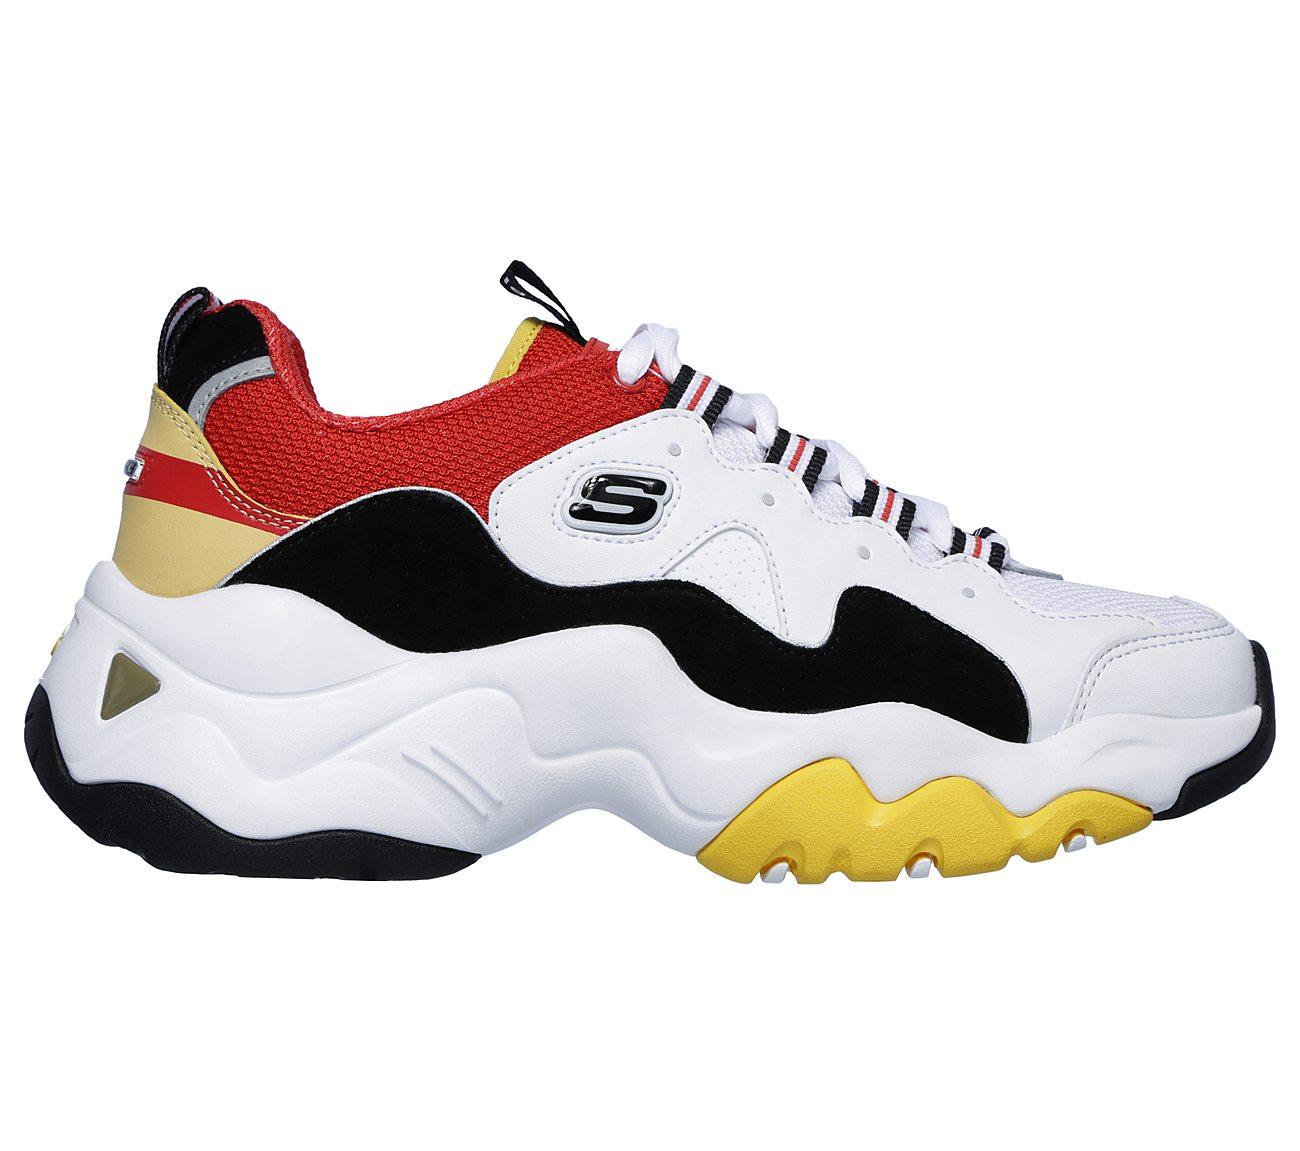 0105a5a9738 Buy SKECHERS D'Lites 3 - One Piece V.2 Skechers D'Lites Shoes only ...